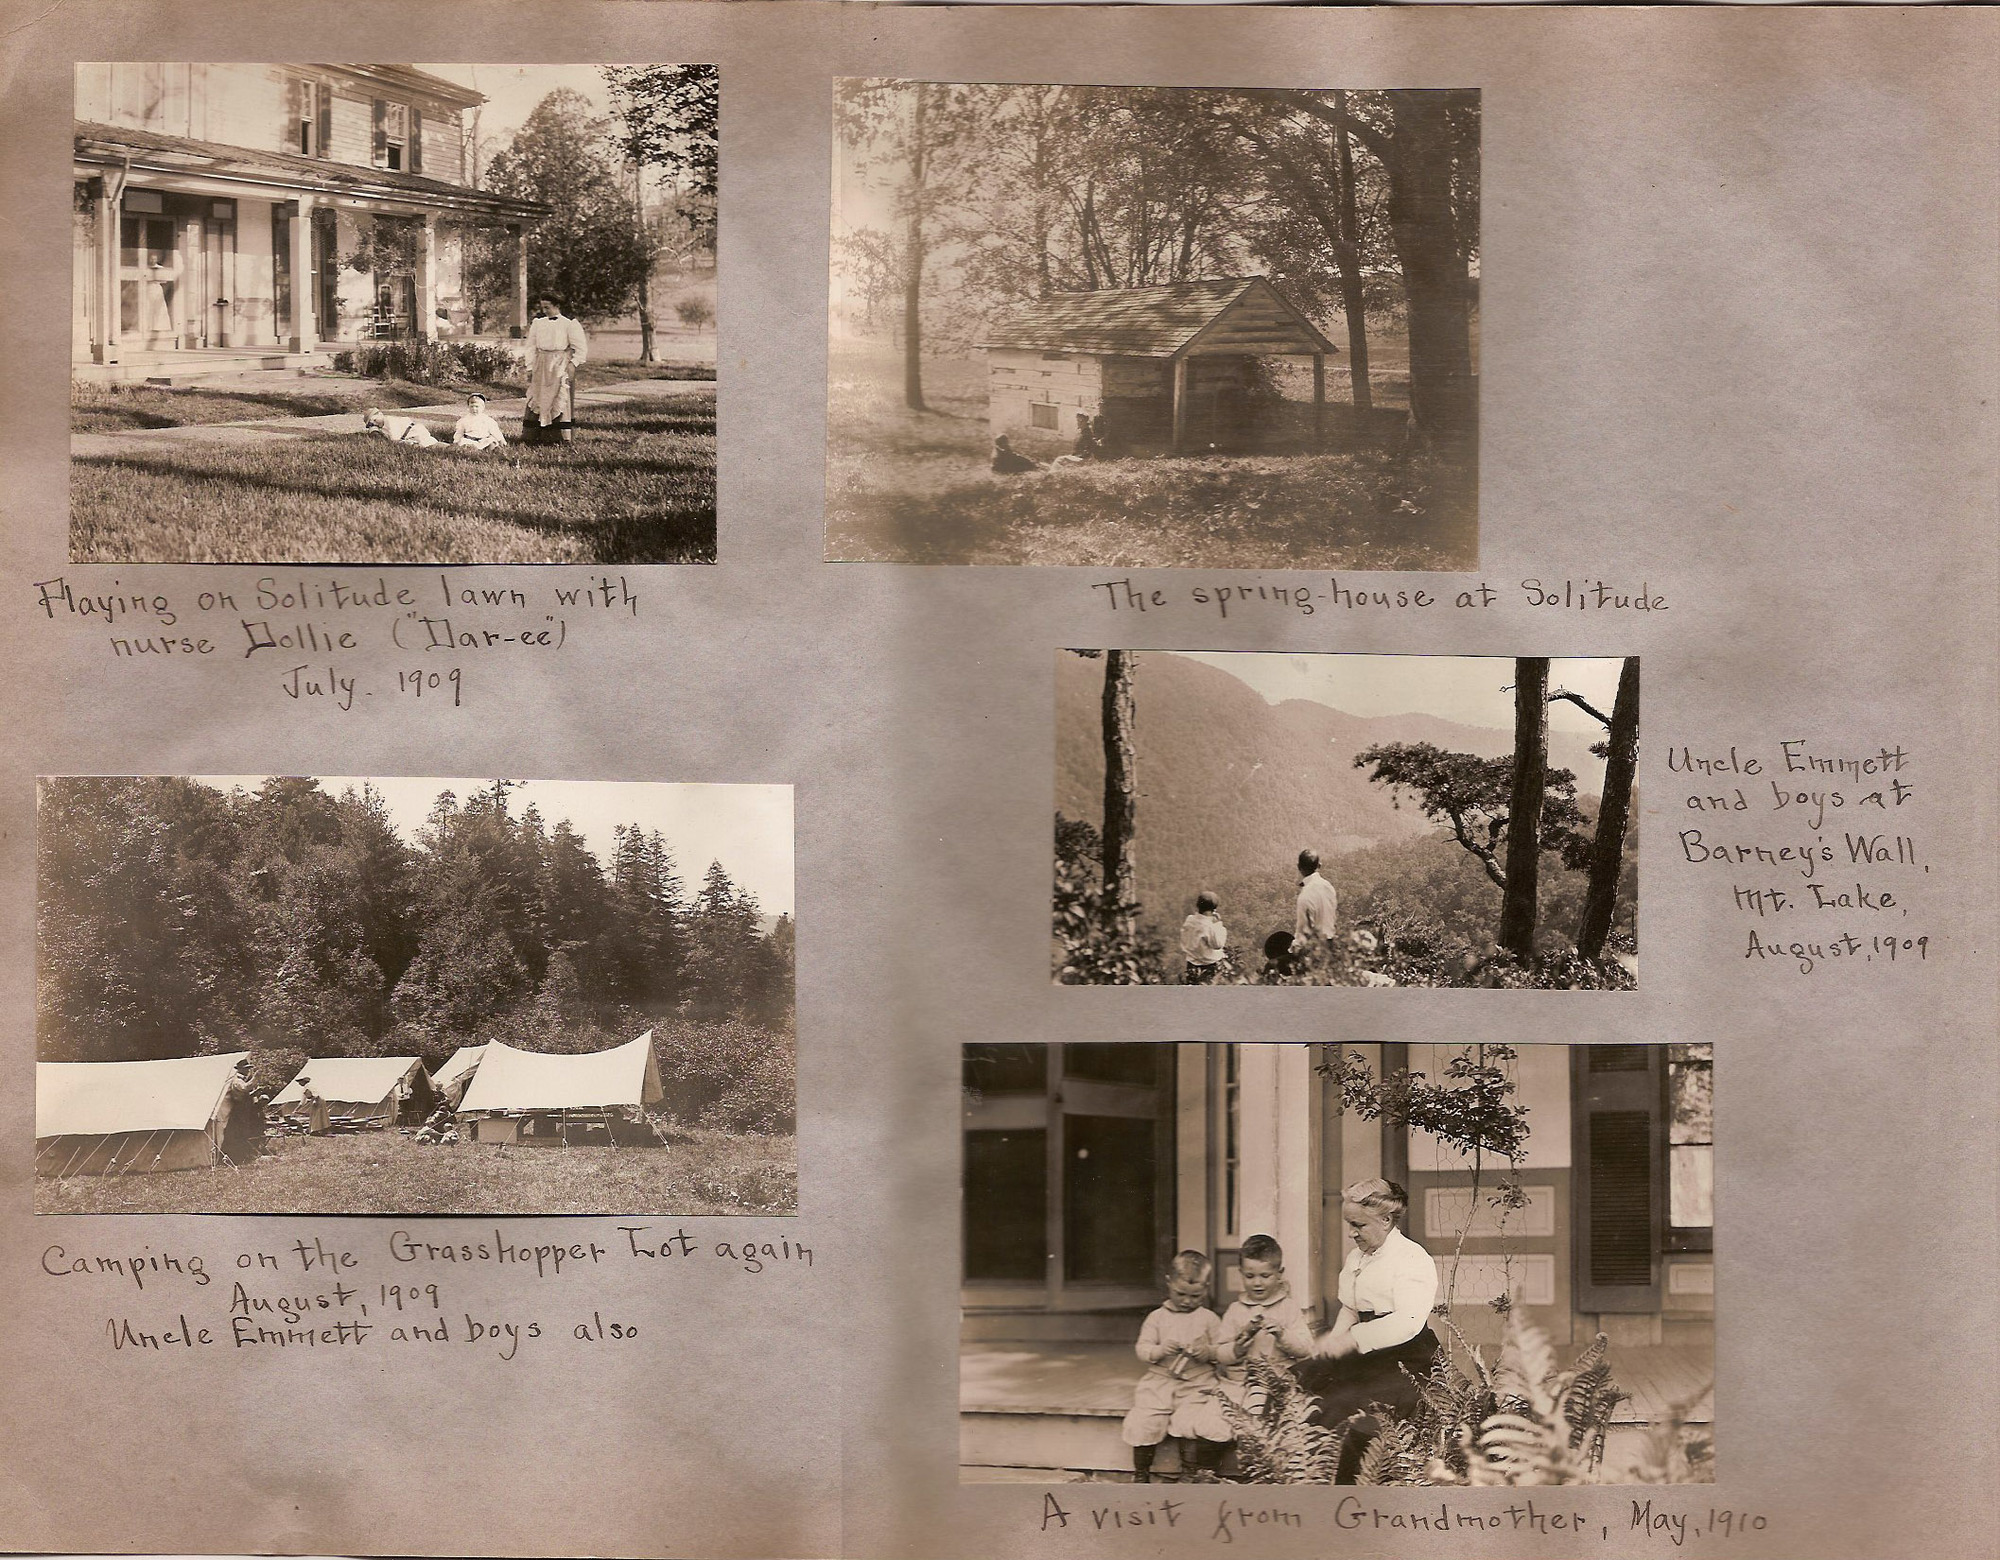 Fletcher_RFletcherPhotos_ScrapbookPage04_1909.jpg